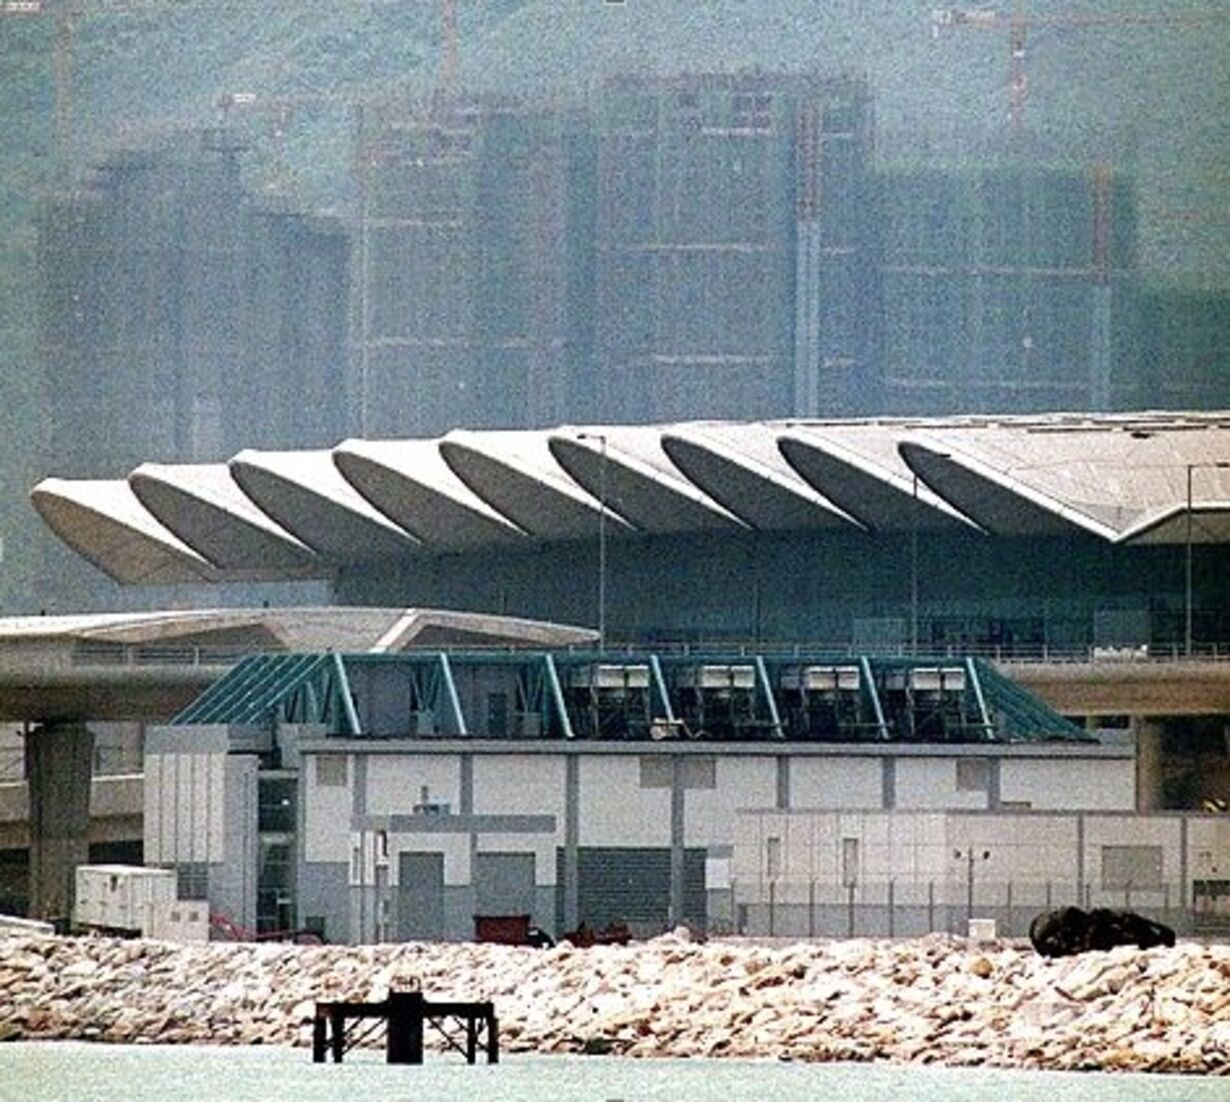 10a - hongkong